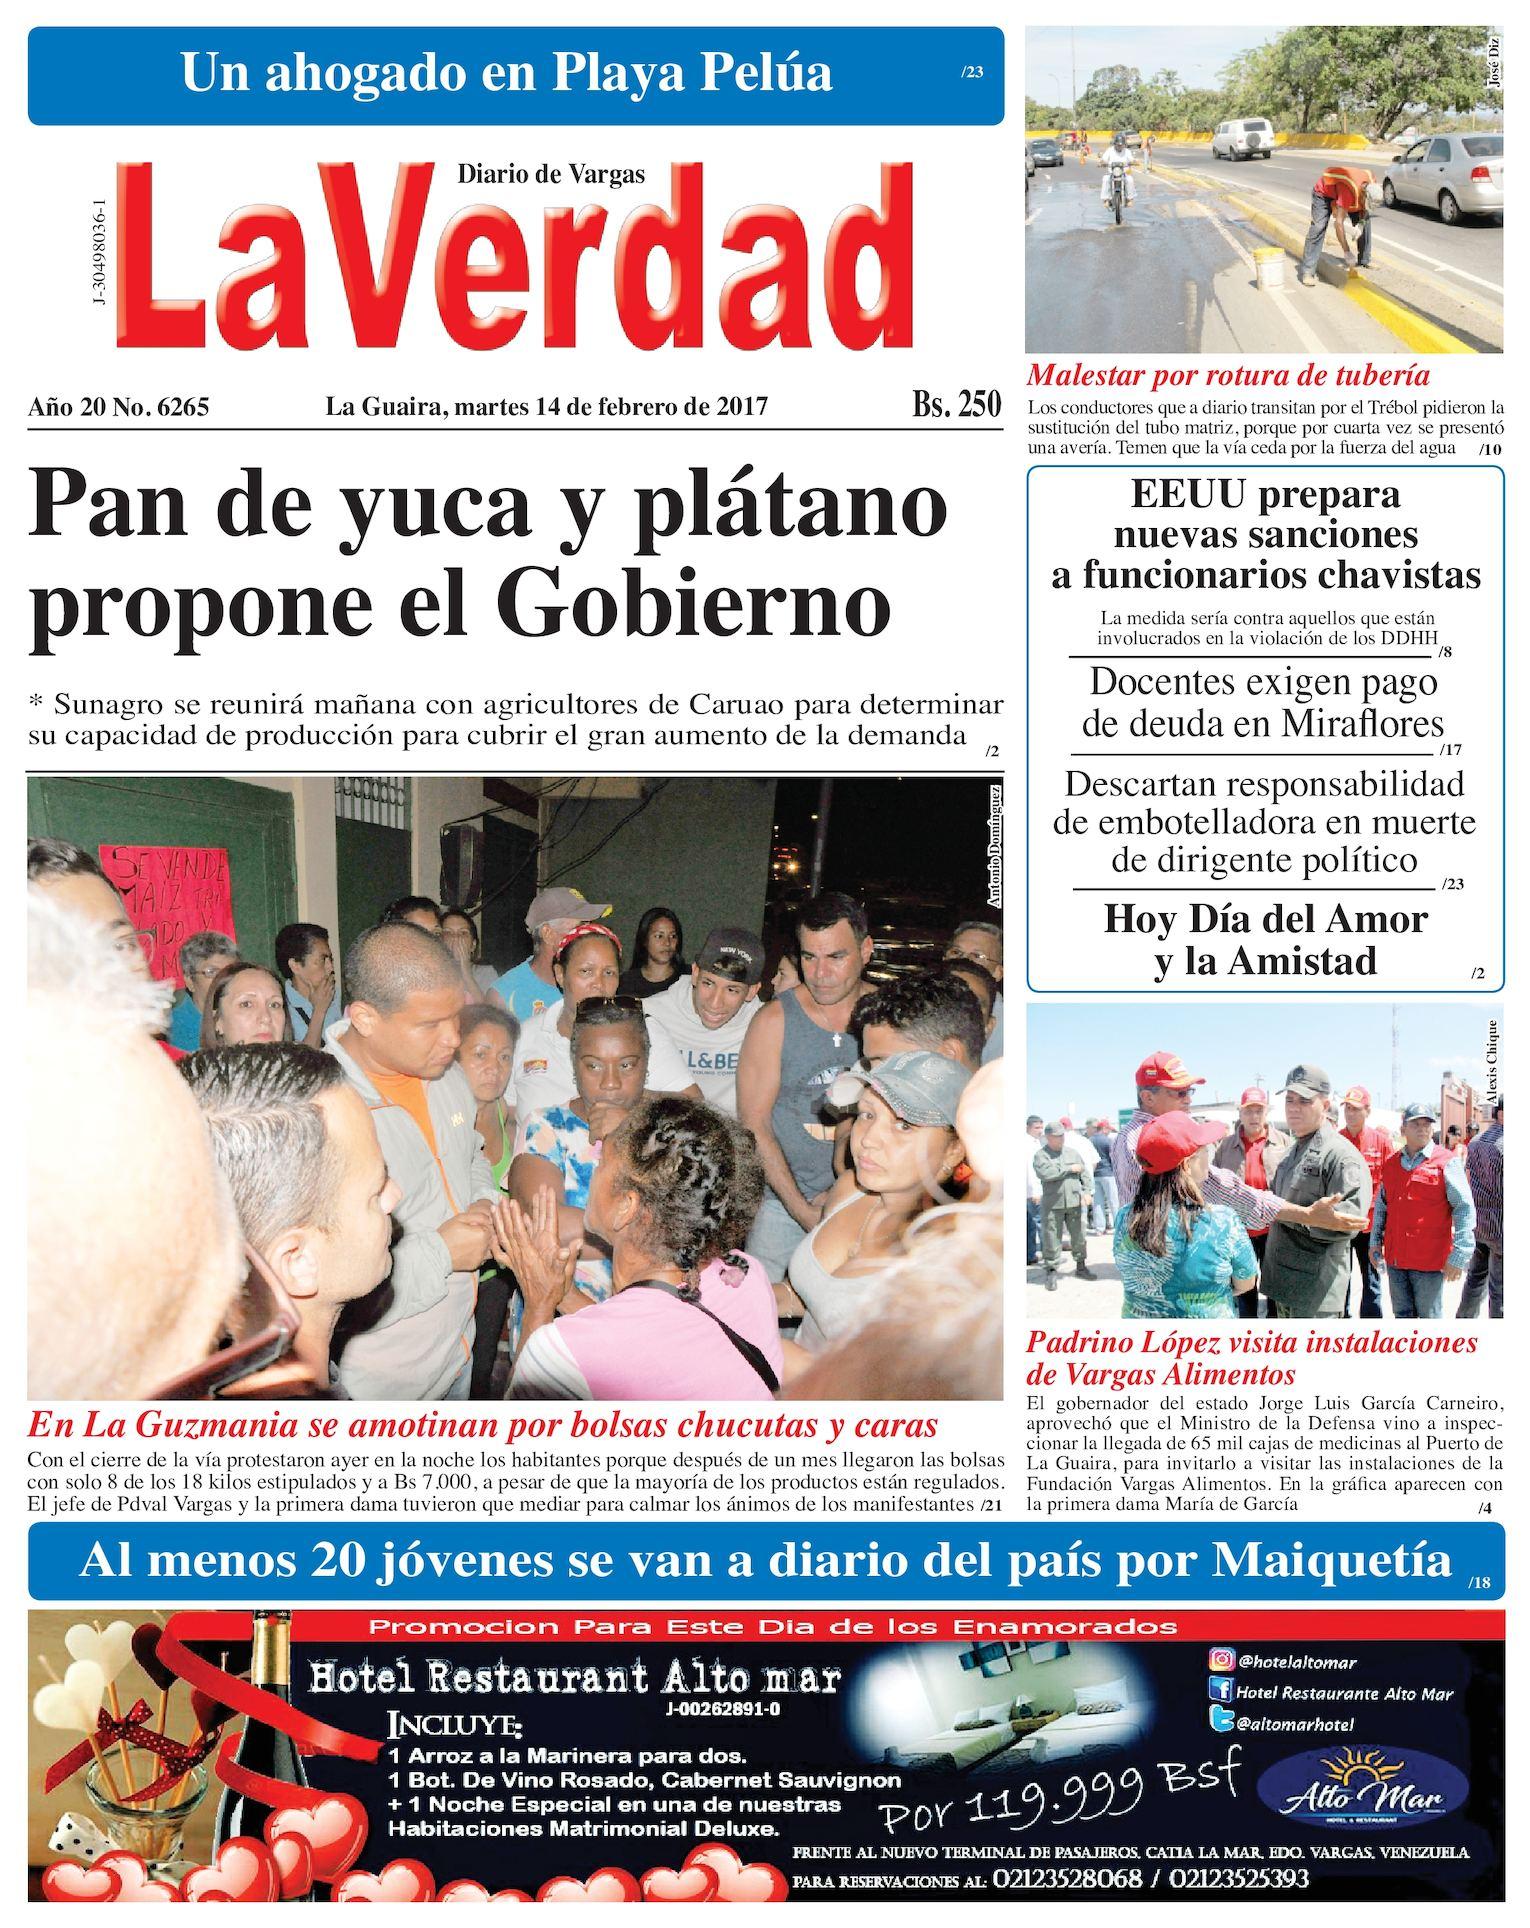 Calaméo - La Guaira, martes 14 de febrero de 2017 Año 20 No. 6265